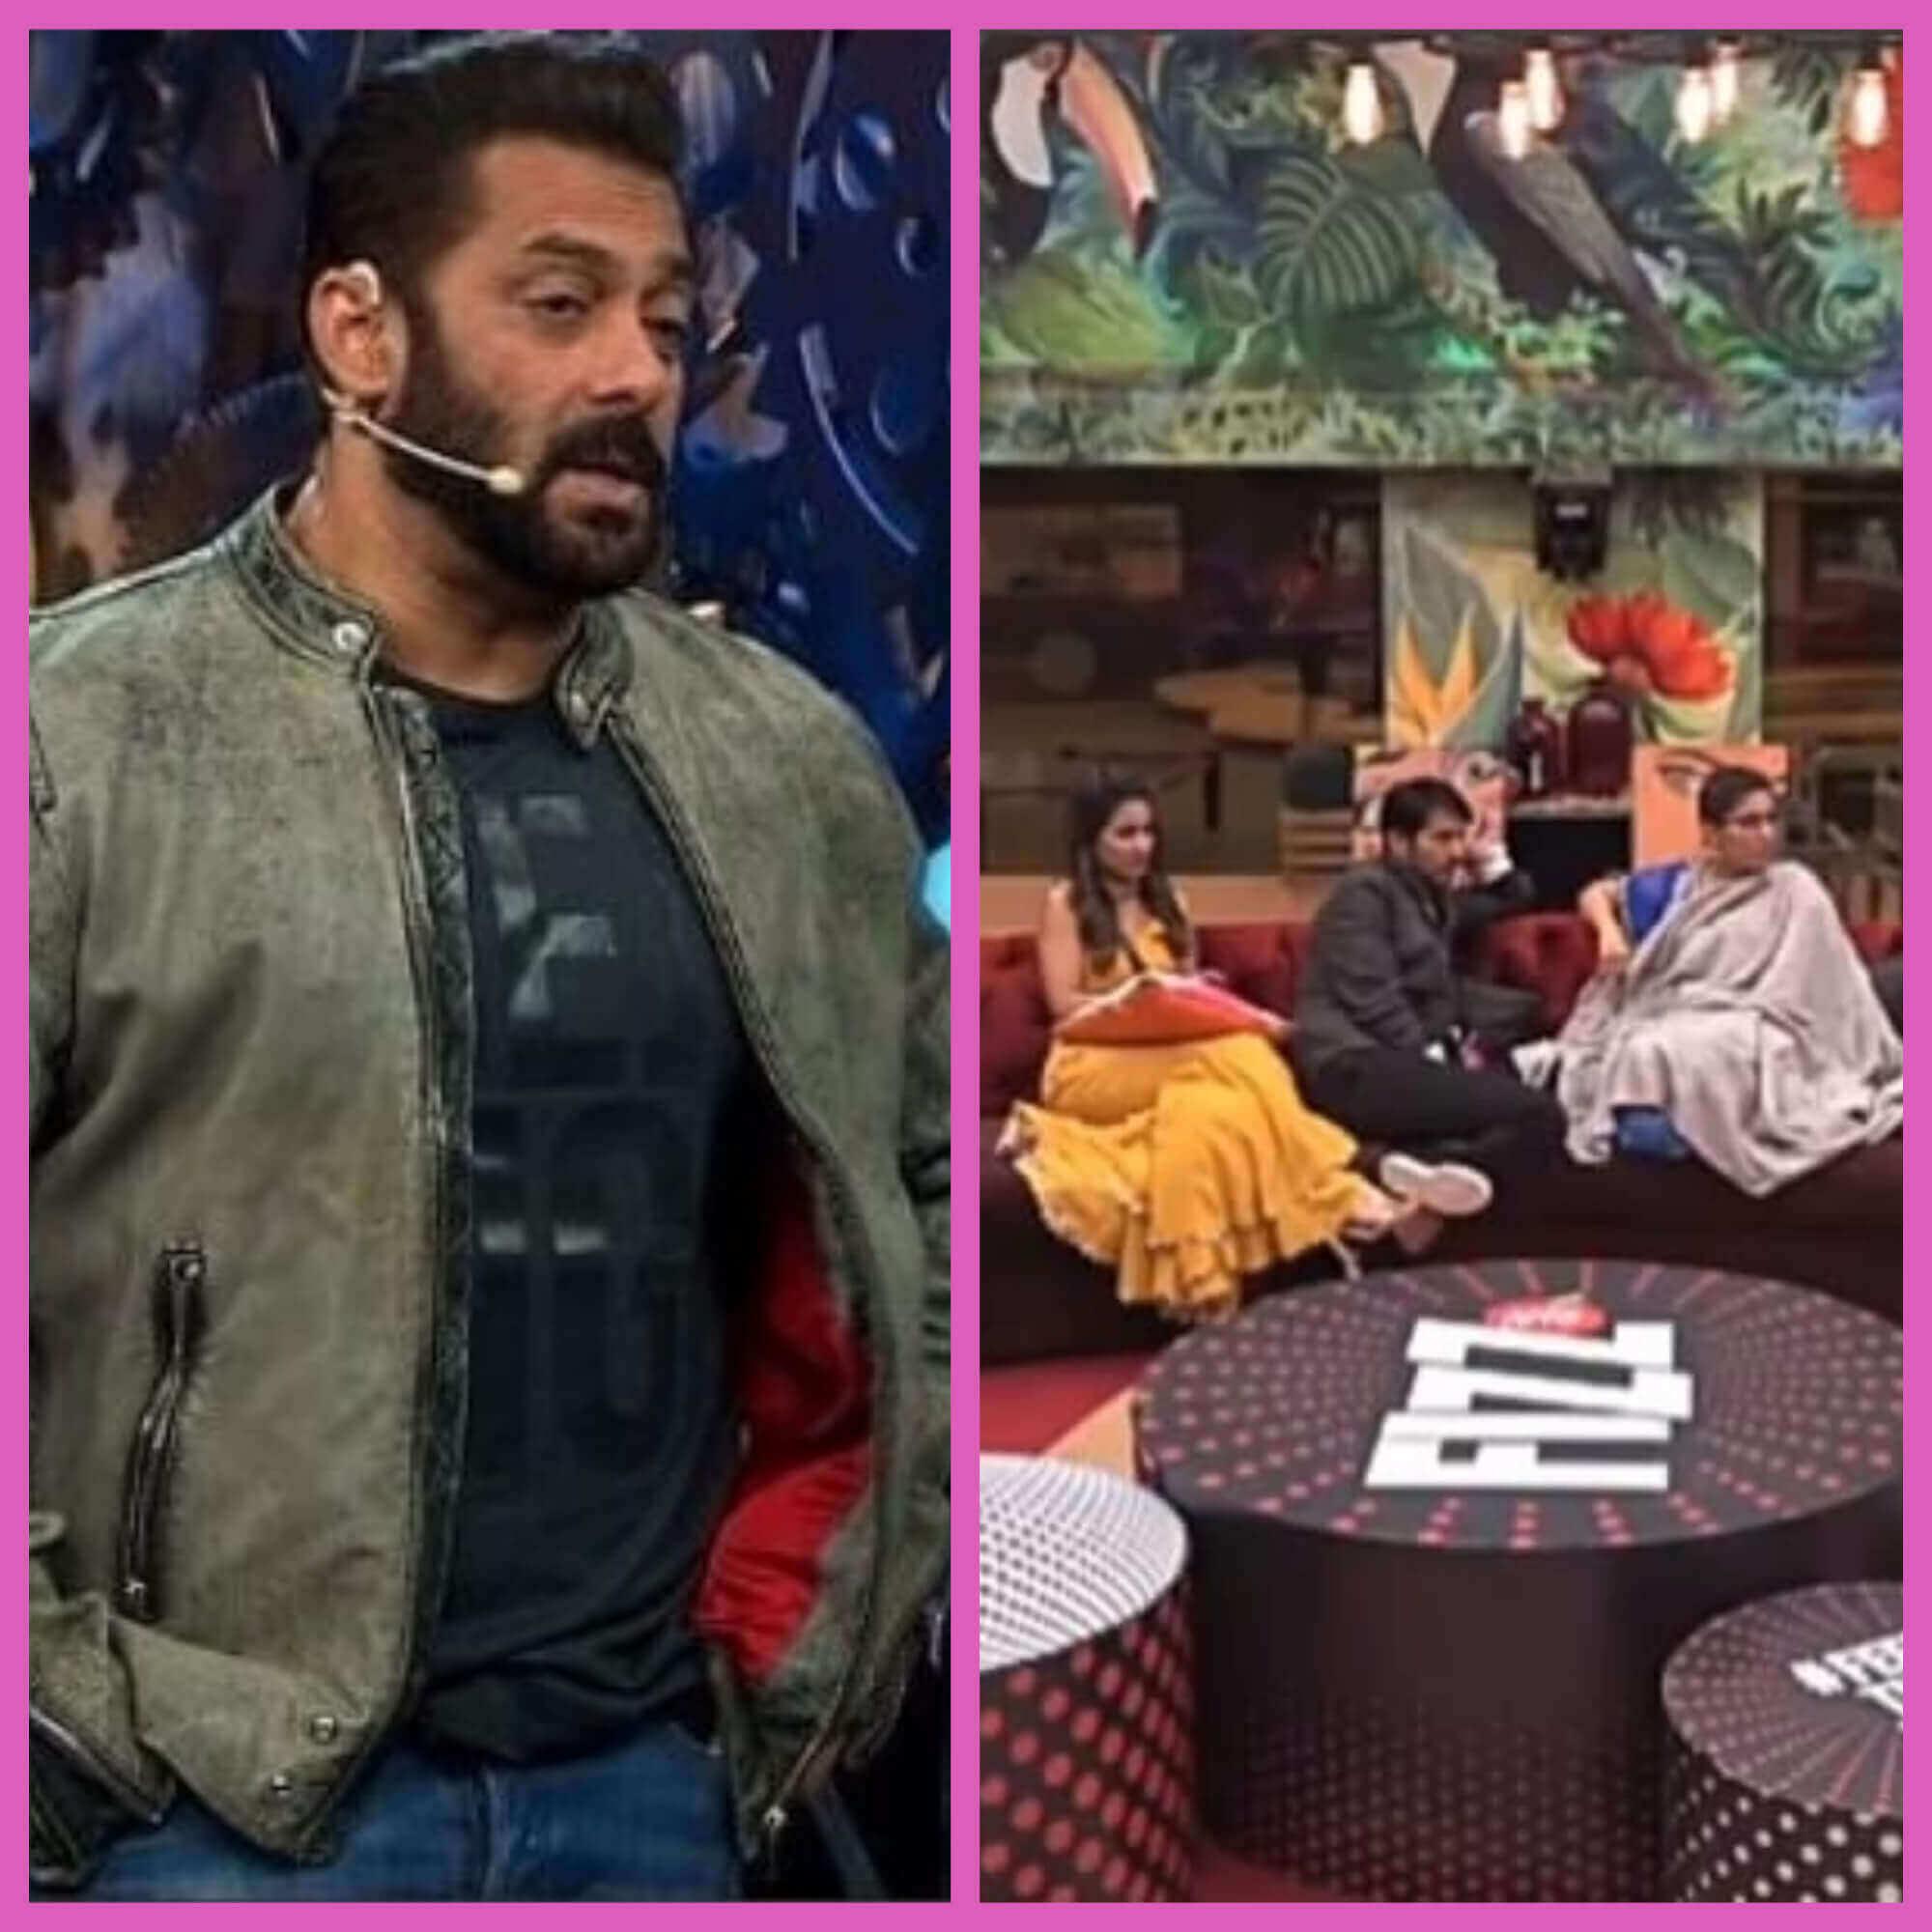 Bigg Boss Weekend Ka Vaar episode on day 35 saw contestant